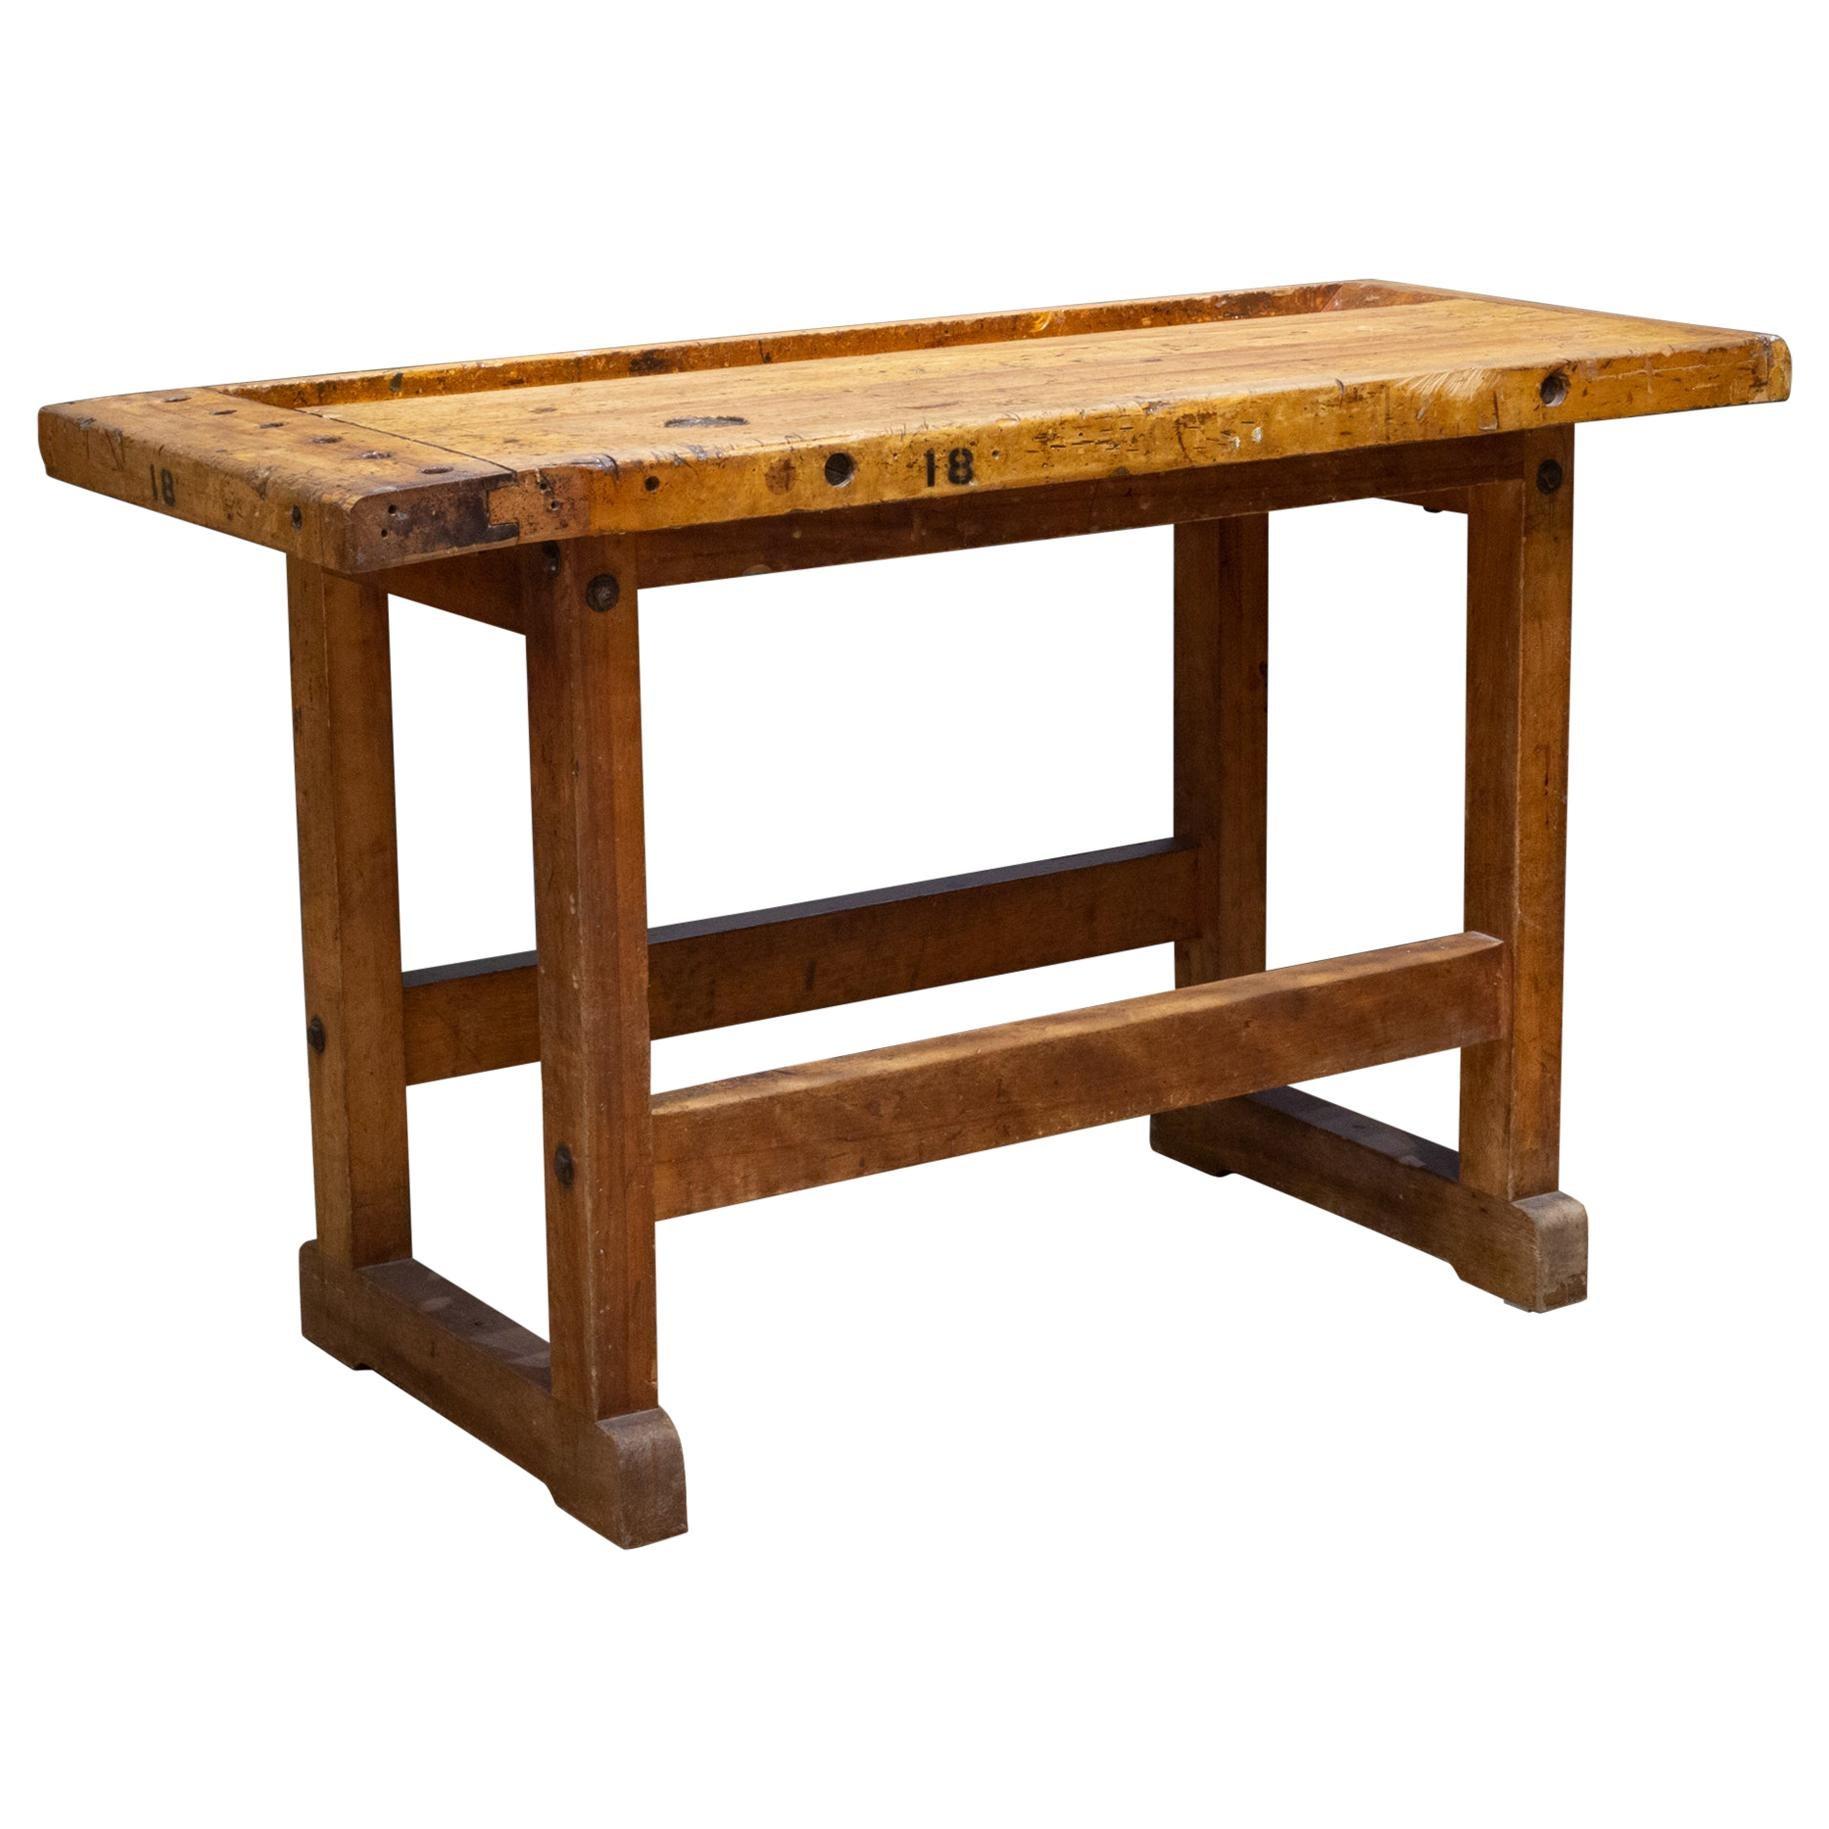 Antique American Carpenter's Workbench, circa 1900